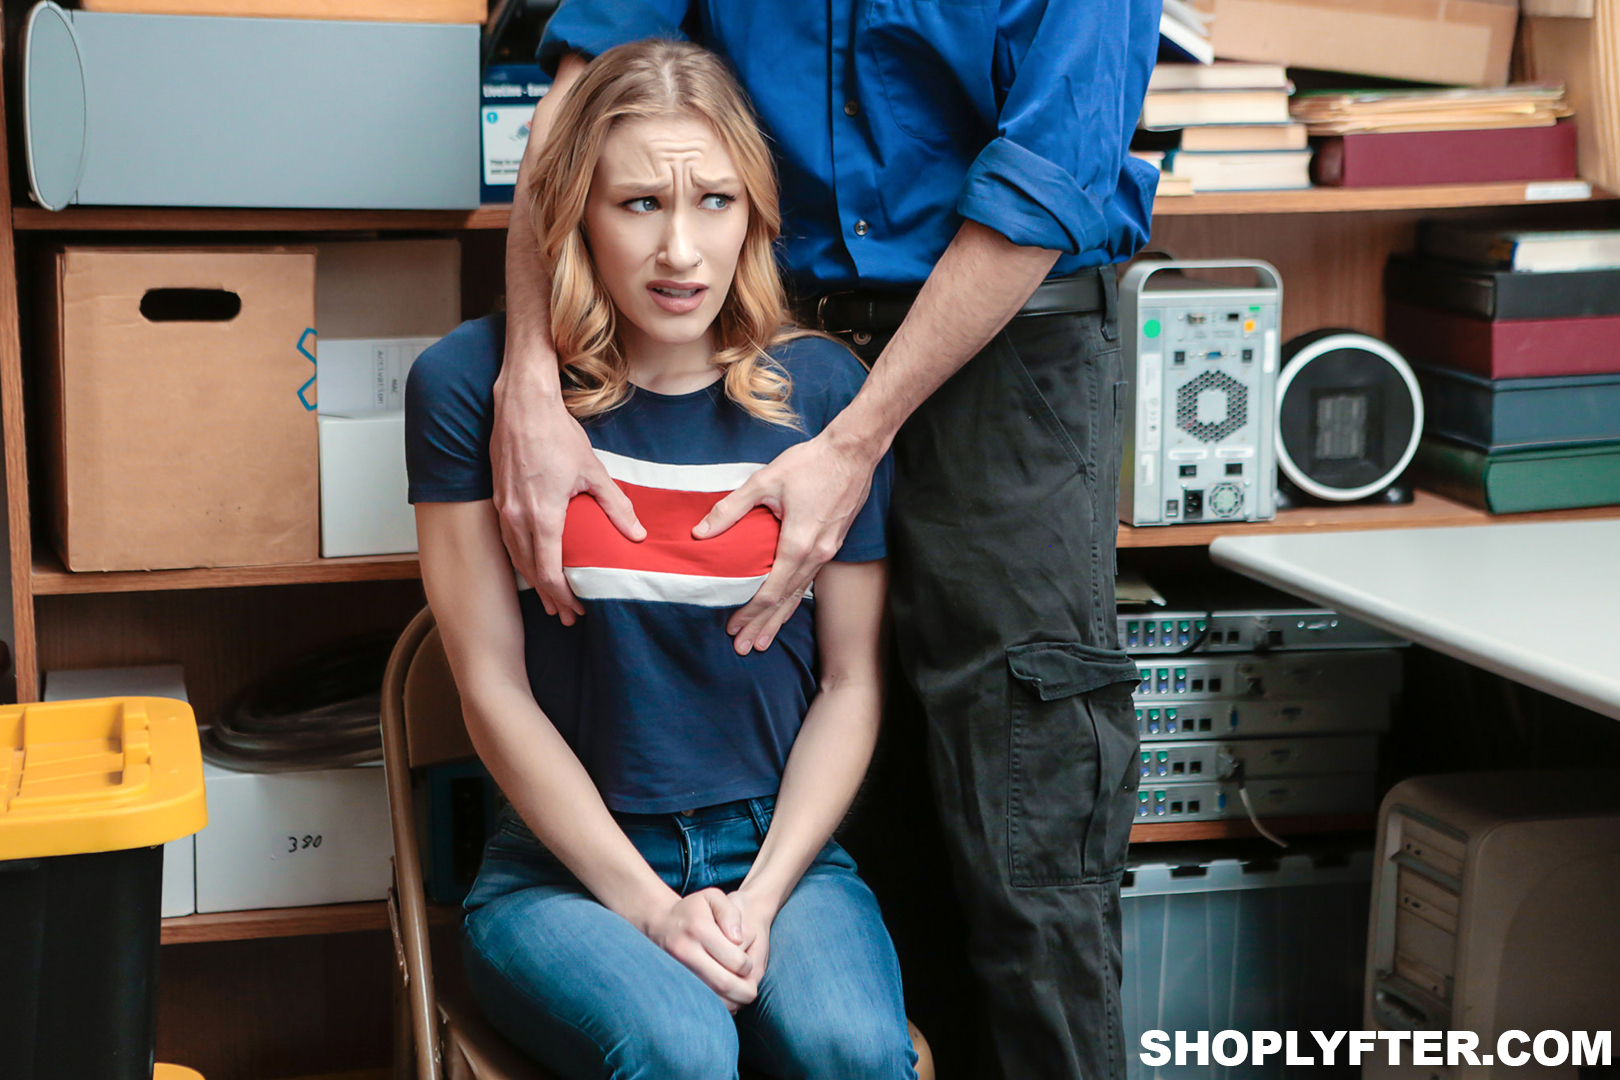 shoplifter sex tube